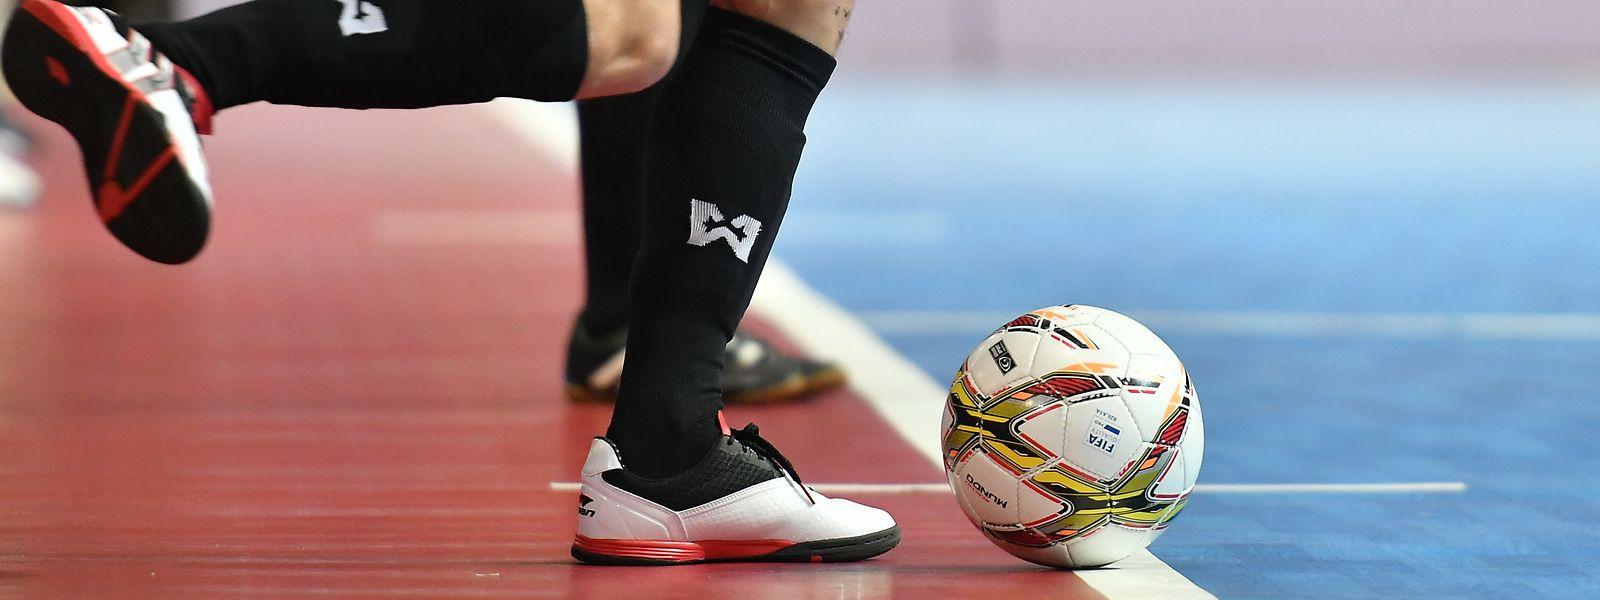 O Futsal Wilwerwiltz foi proibido de utilisar o pavilhão onde disputava os jogos da Liga 2 do campeonato luxemburguês de futsal.